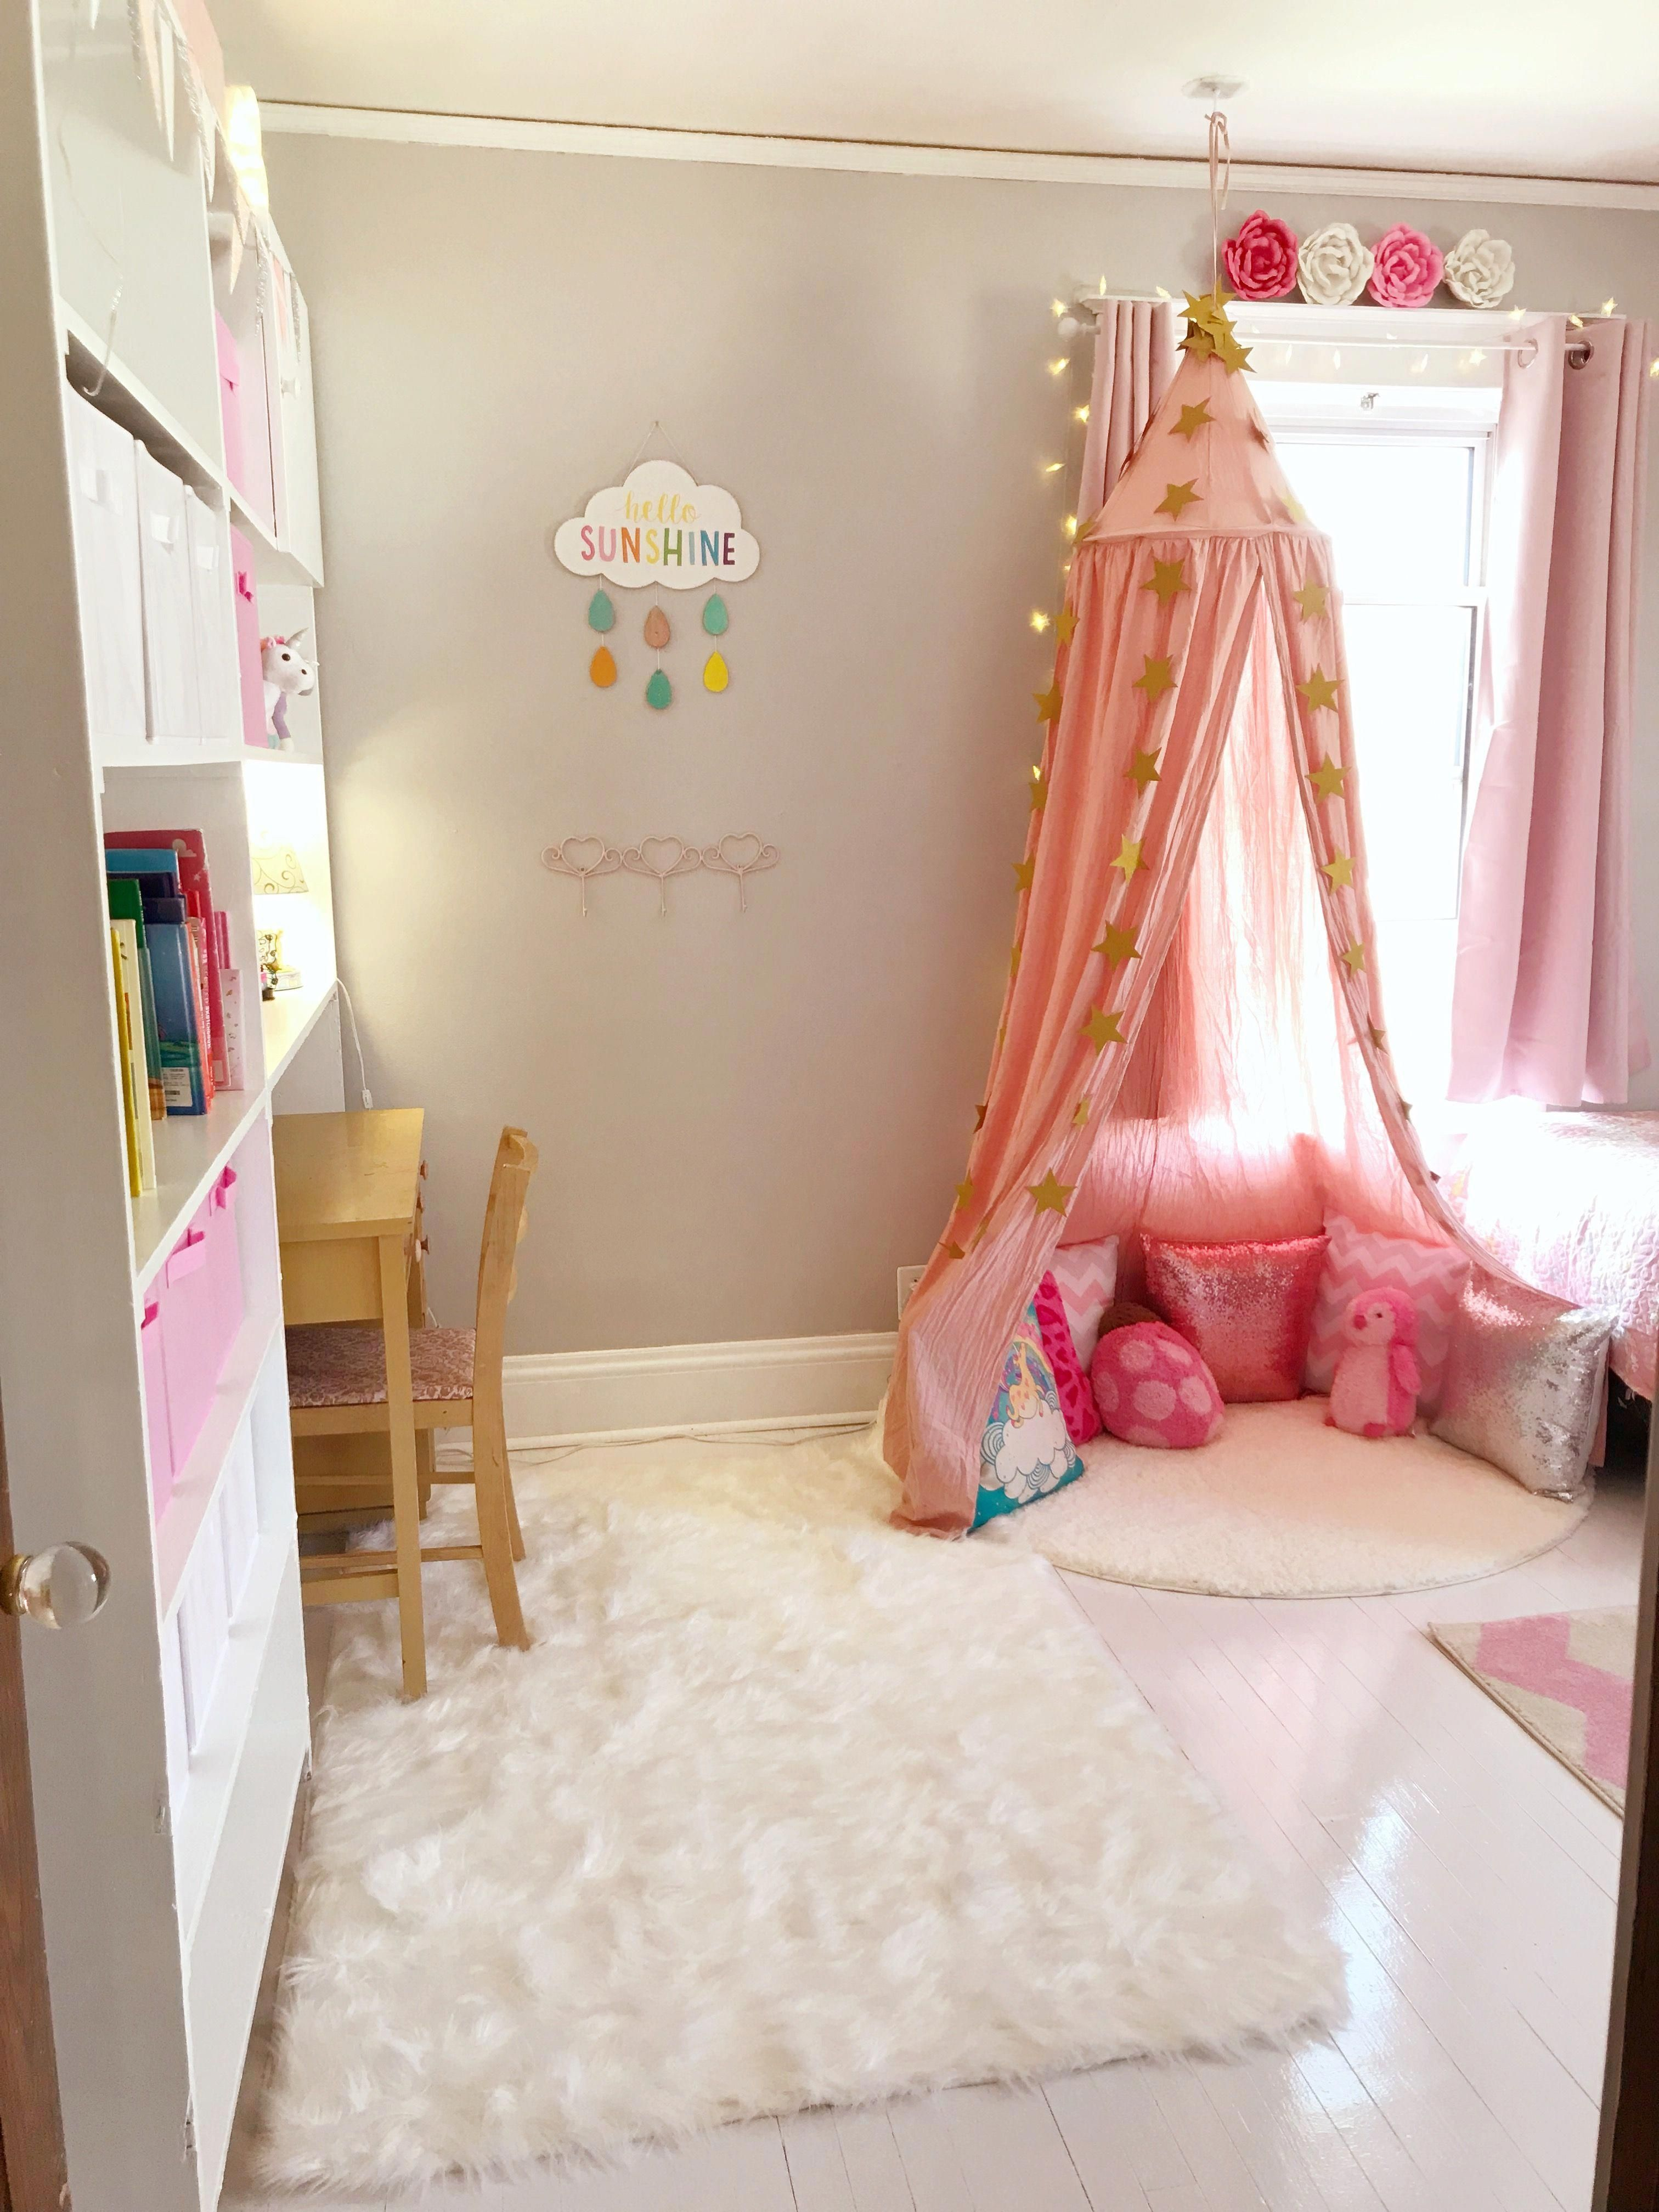 Girls Bedroom Ideas Cute Bedroom Girls Room Decor Pink Bedroom Pink And Gray Bedroom White Wo Pink Bedroom For Girls Tween Girl Bedroom Girl Bedroom Decor